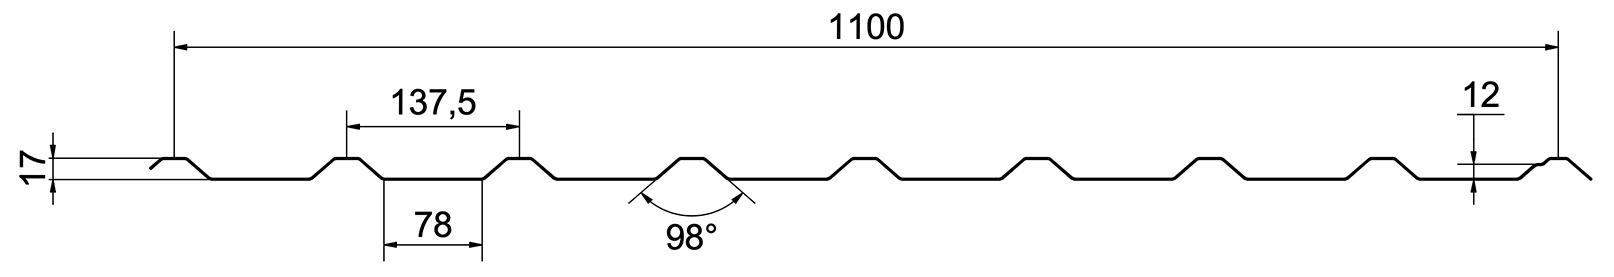 tr20 diagram